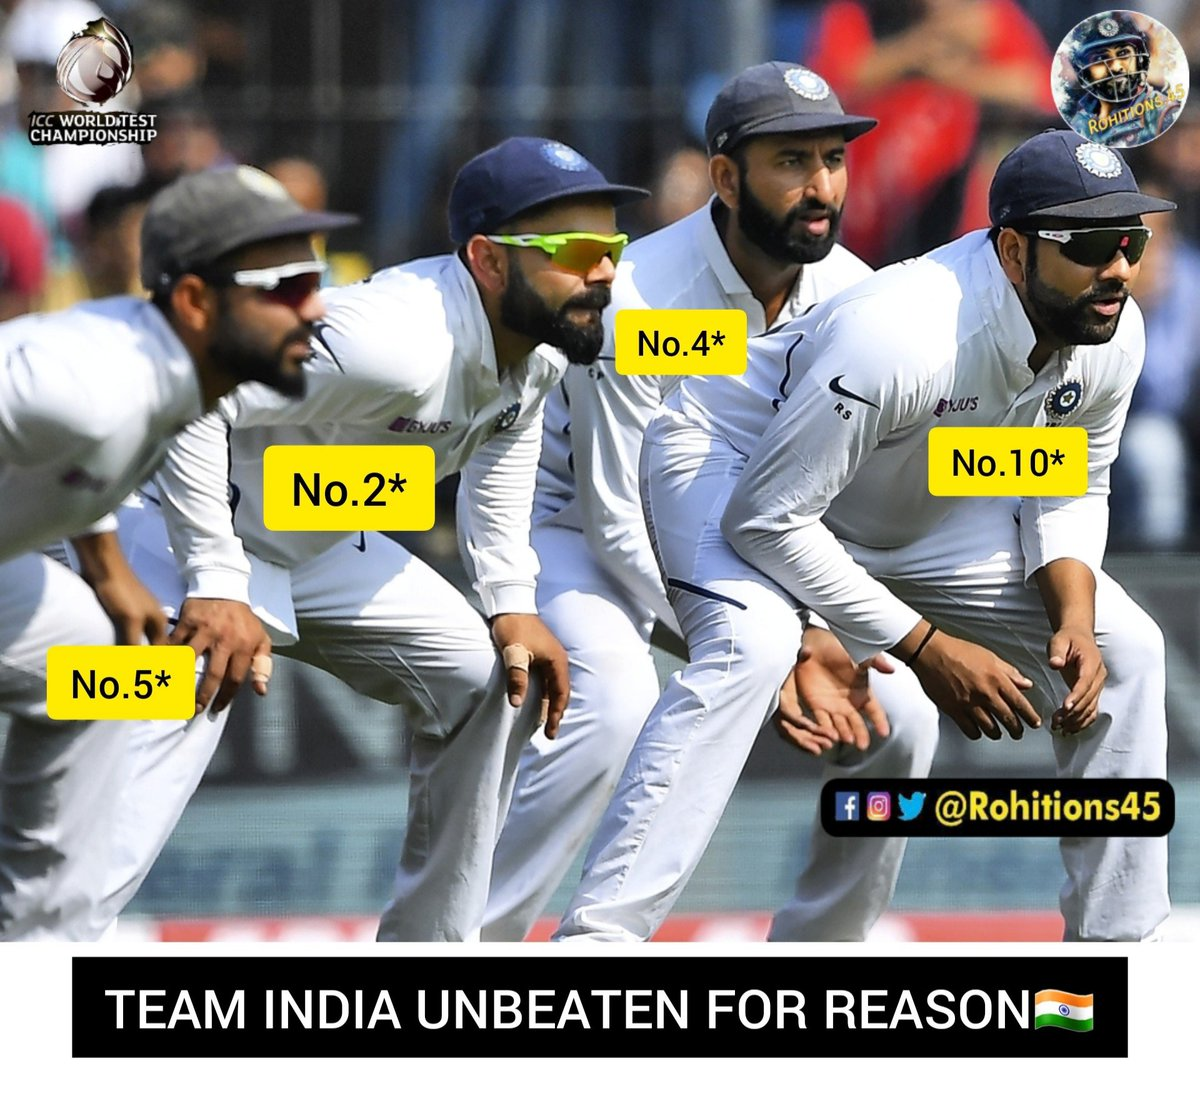 Soon @mayankcricket Will Join Top 10🙈@ImRo45 @ritssajdeh @soumitraro45@imVkohli @cheteshwar1 @ajinkyarahane88#TeamIndia #rohitions45 #indvssa #indvsa #rohitopensagain #rohitsharma #rohitsharma45